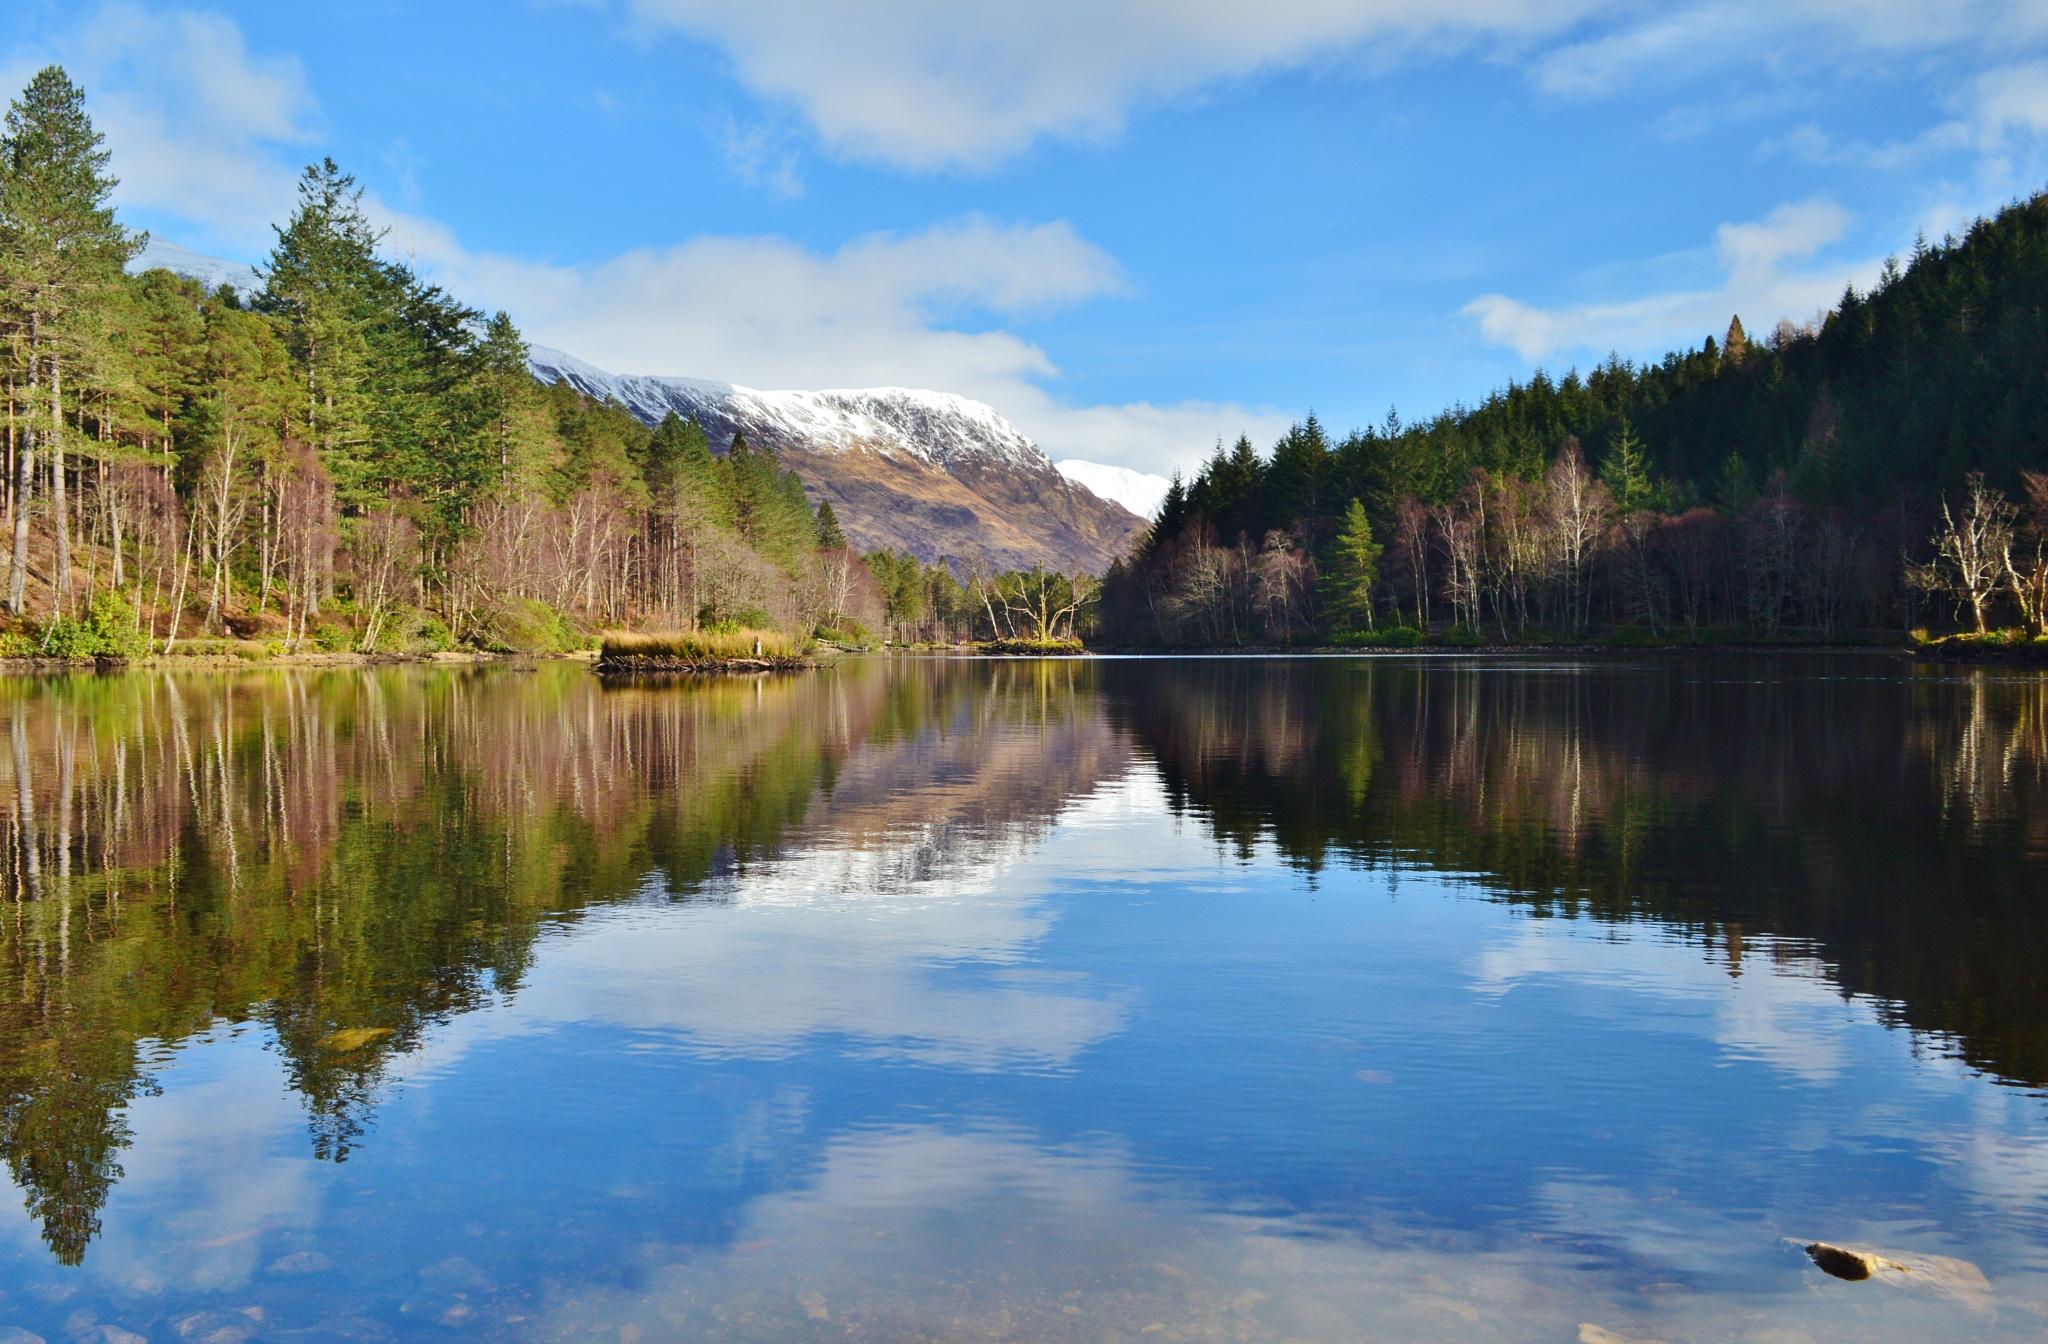 Reflections on Glencoe Lochan by garybr66